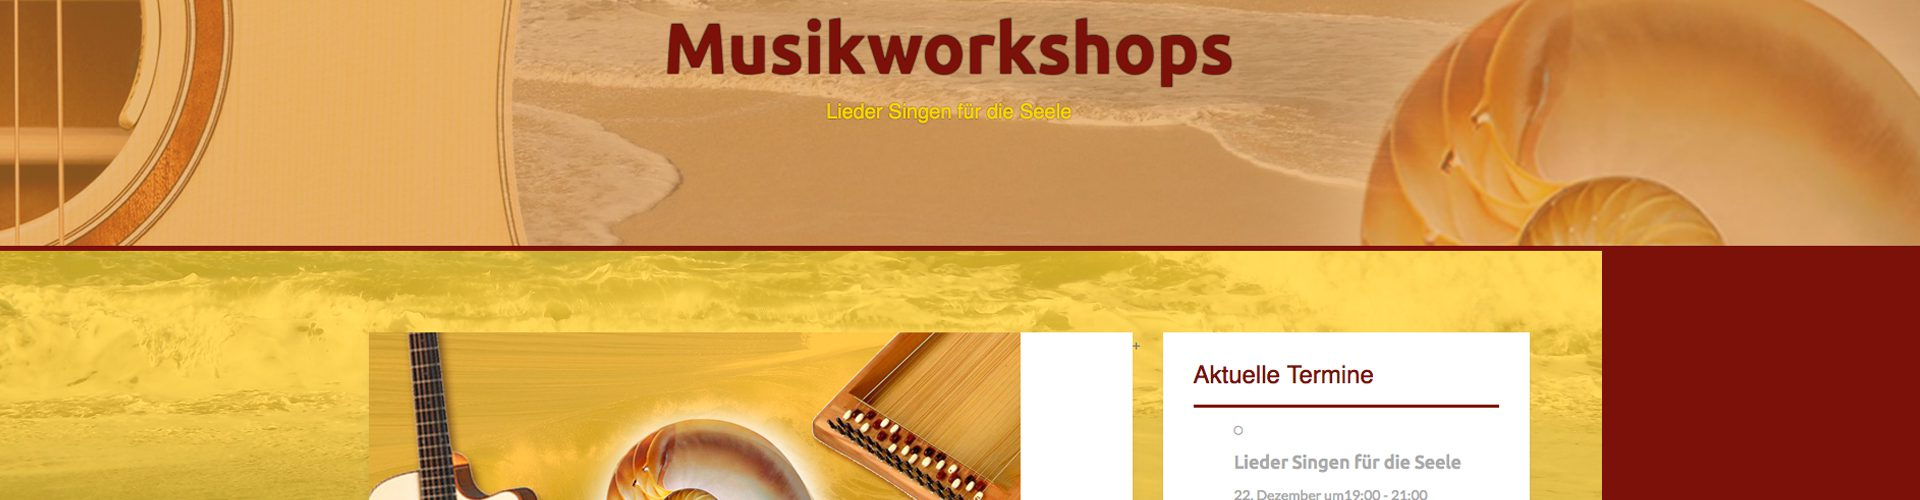 GraphikundGestaltung Grafik und Gestaltung Christoph Fincke Kunden: Musikworkshops